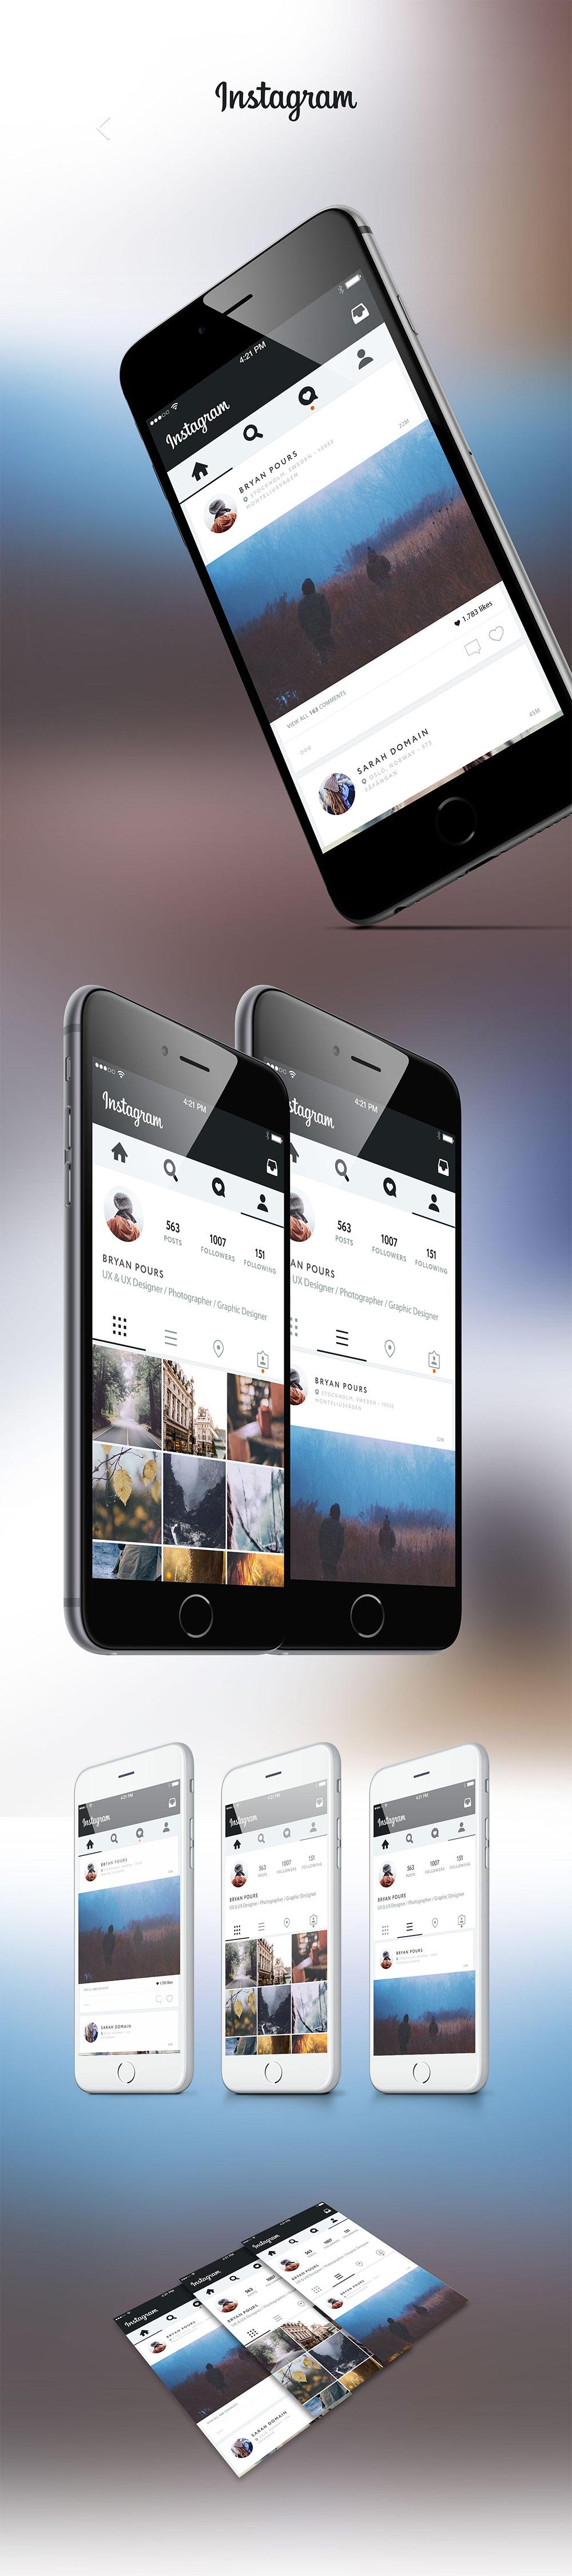 Instagram Application UI Revamp Concept Free PSD